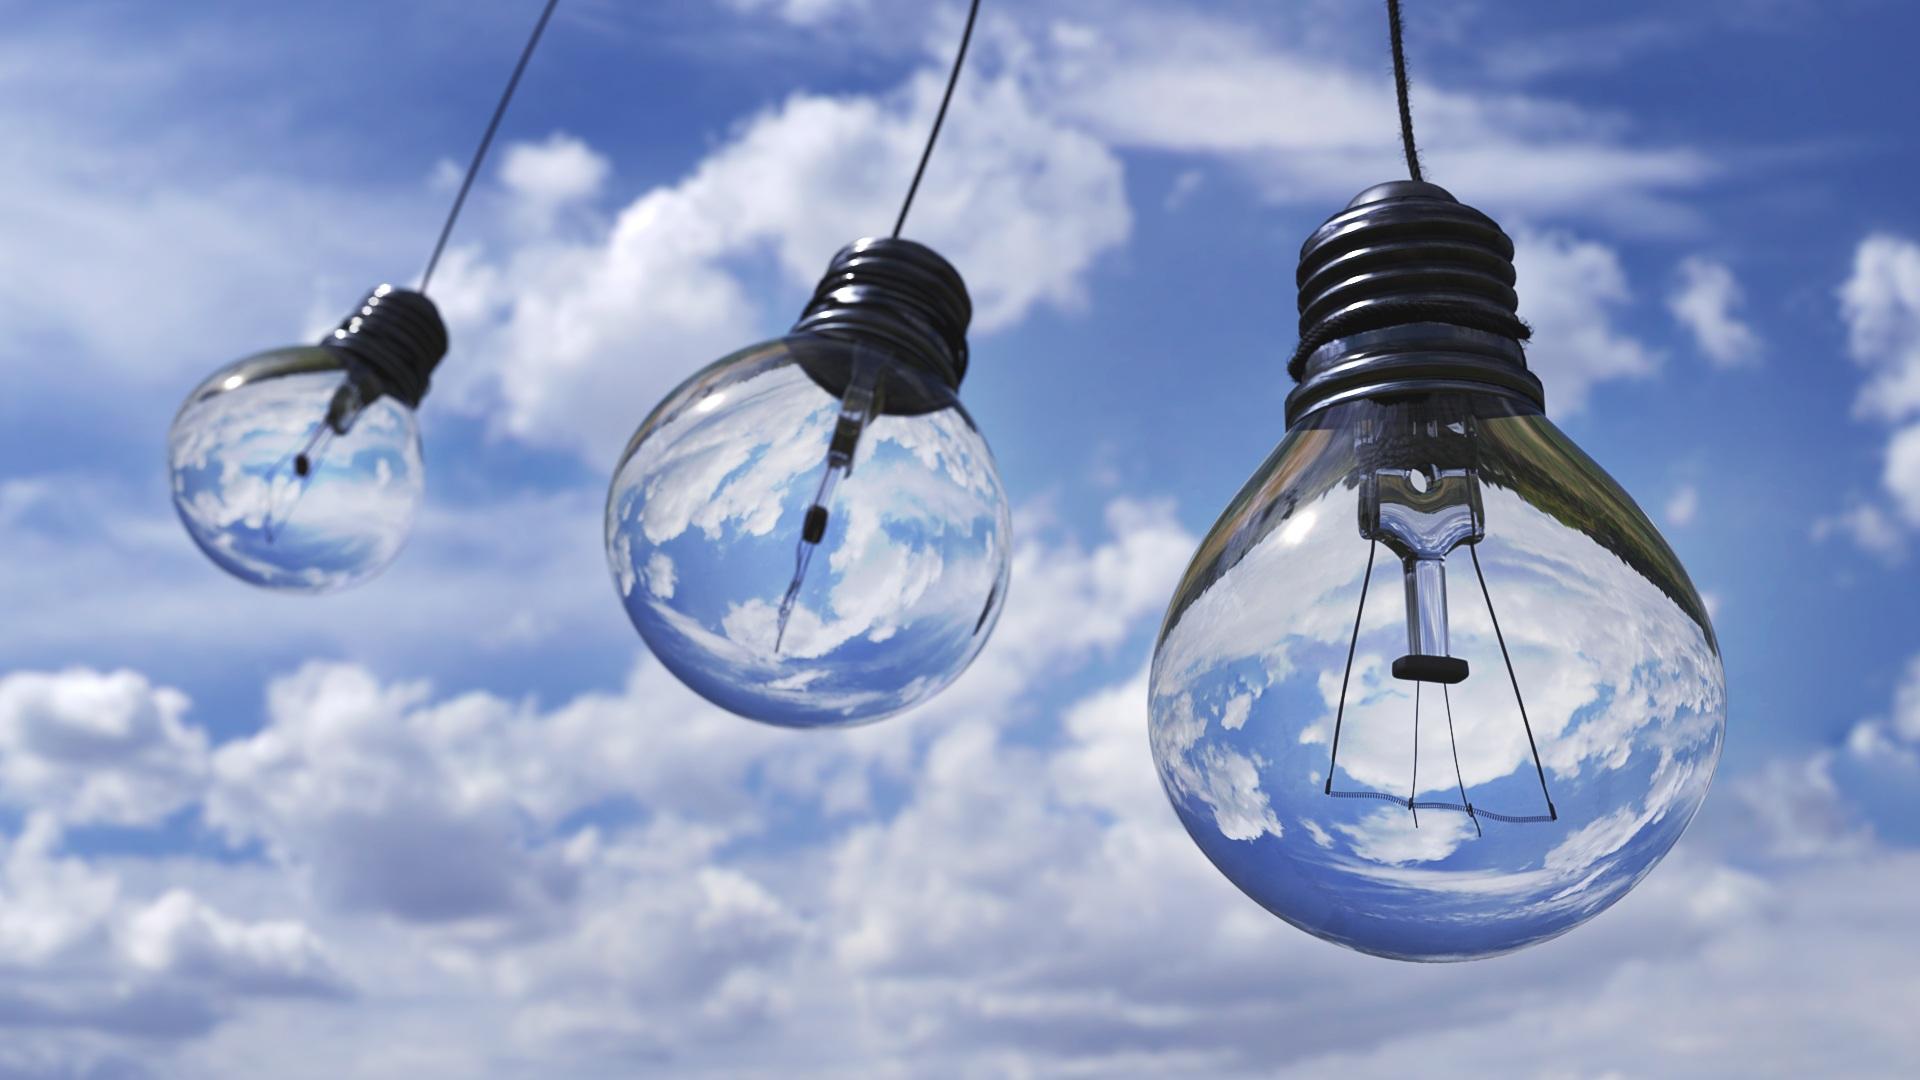 light bulbs and sky.jpeg